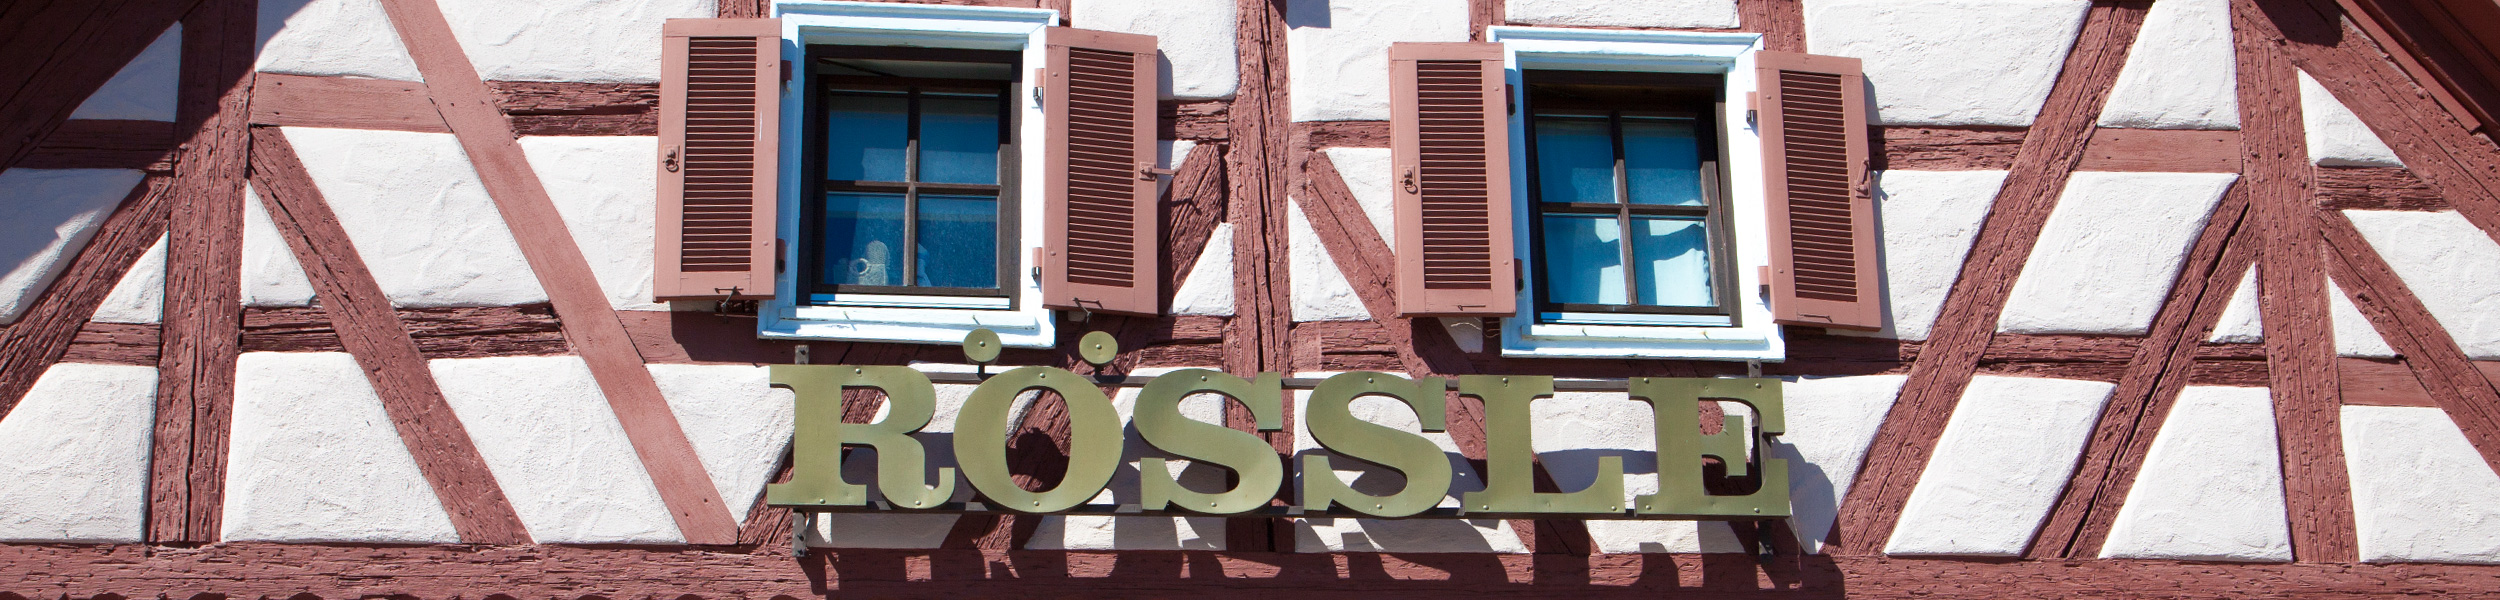 Impressum | Gasthof Rössle in Rangendingen